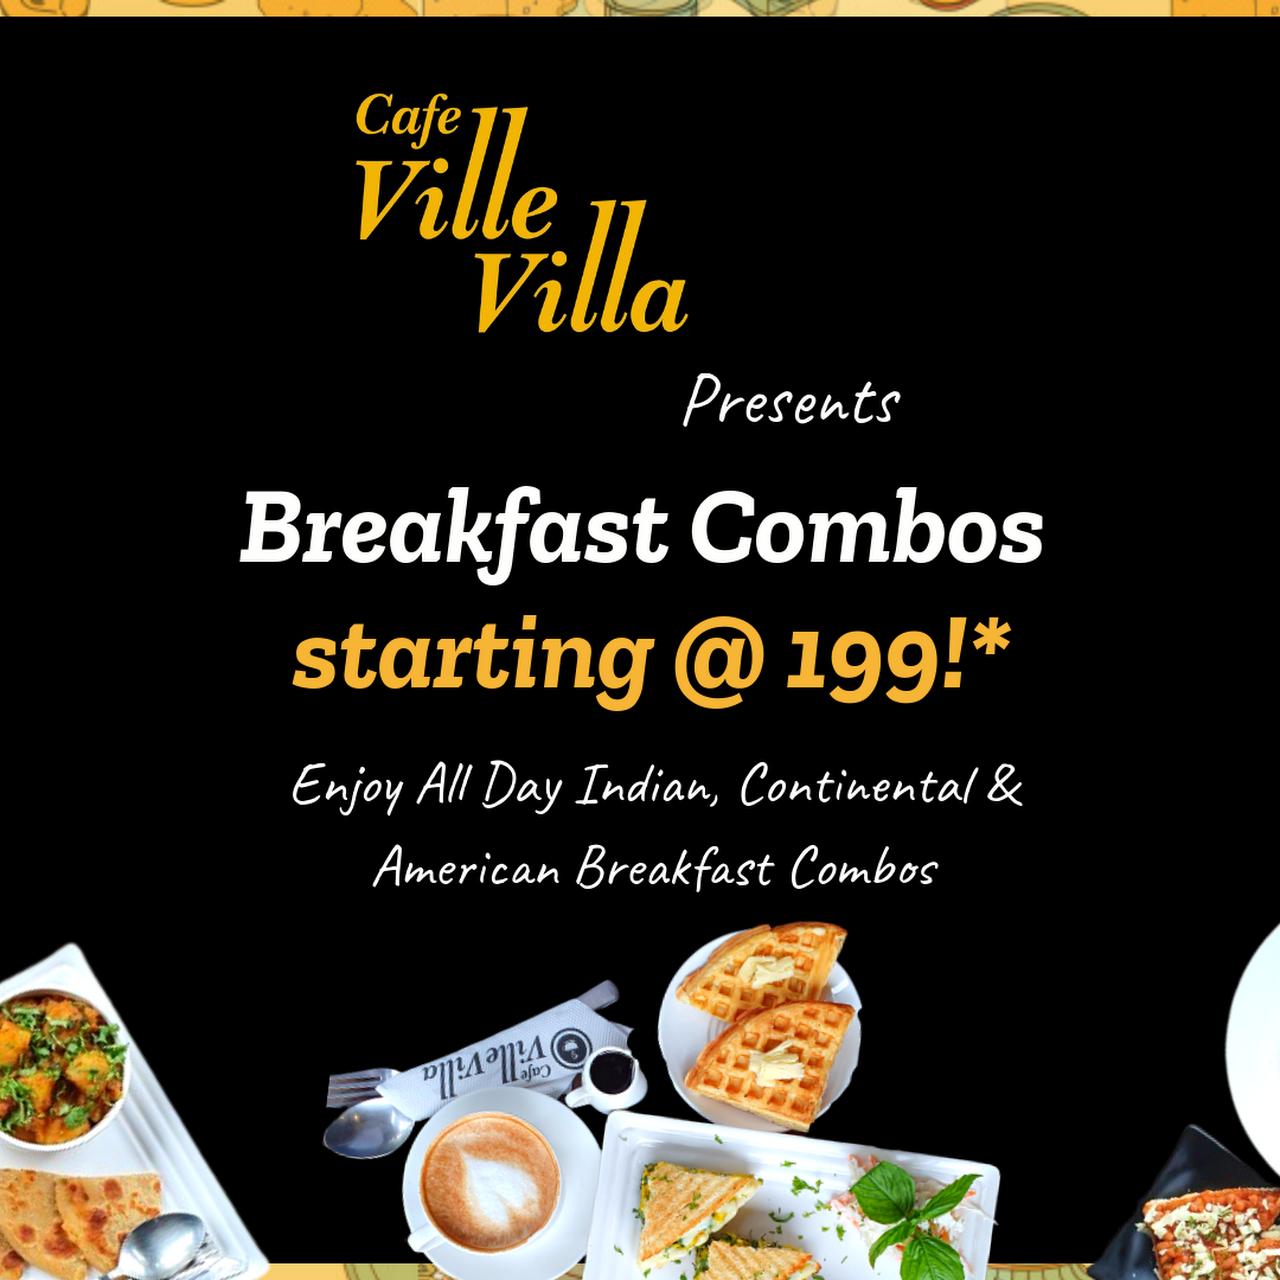 Cafe Ville villa - Cafe in Mumbai